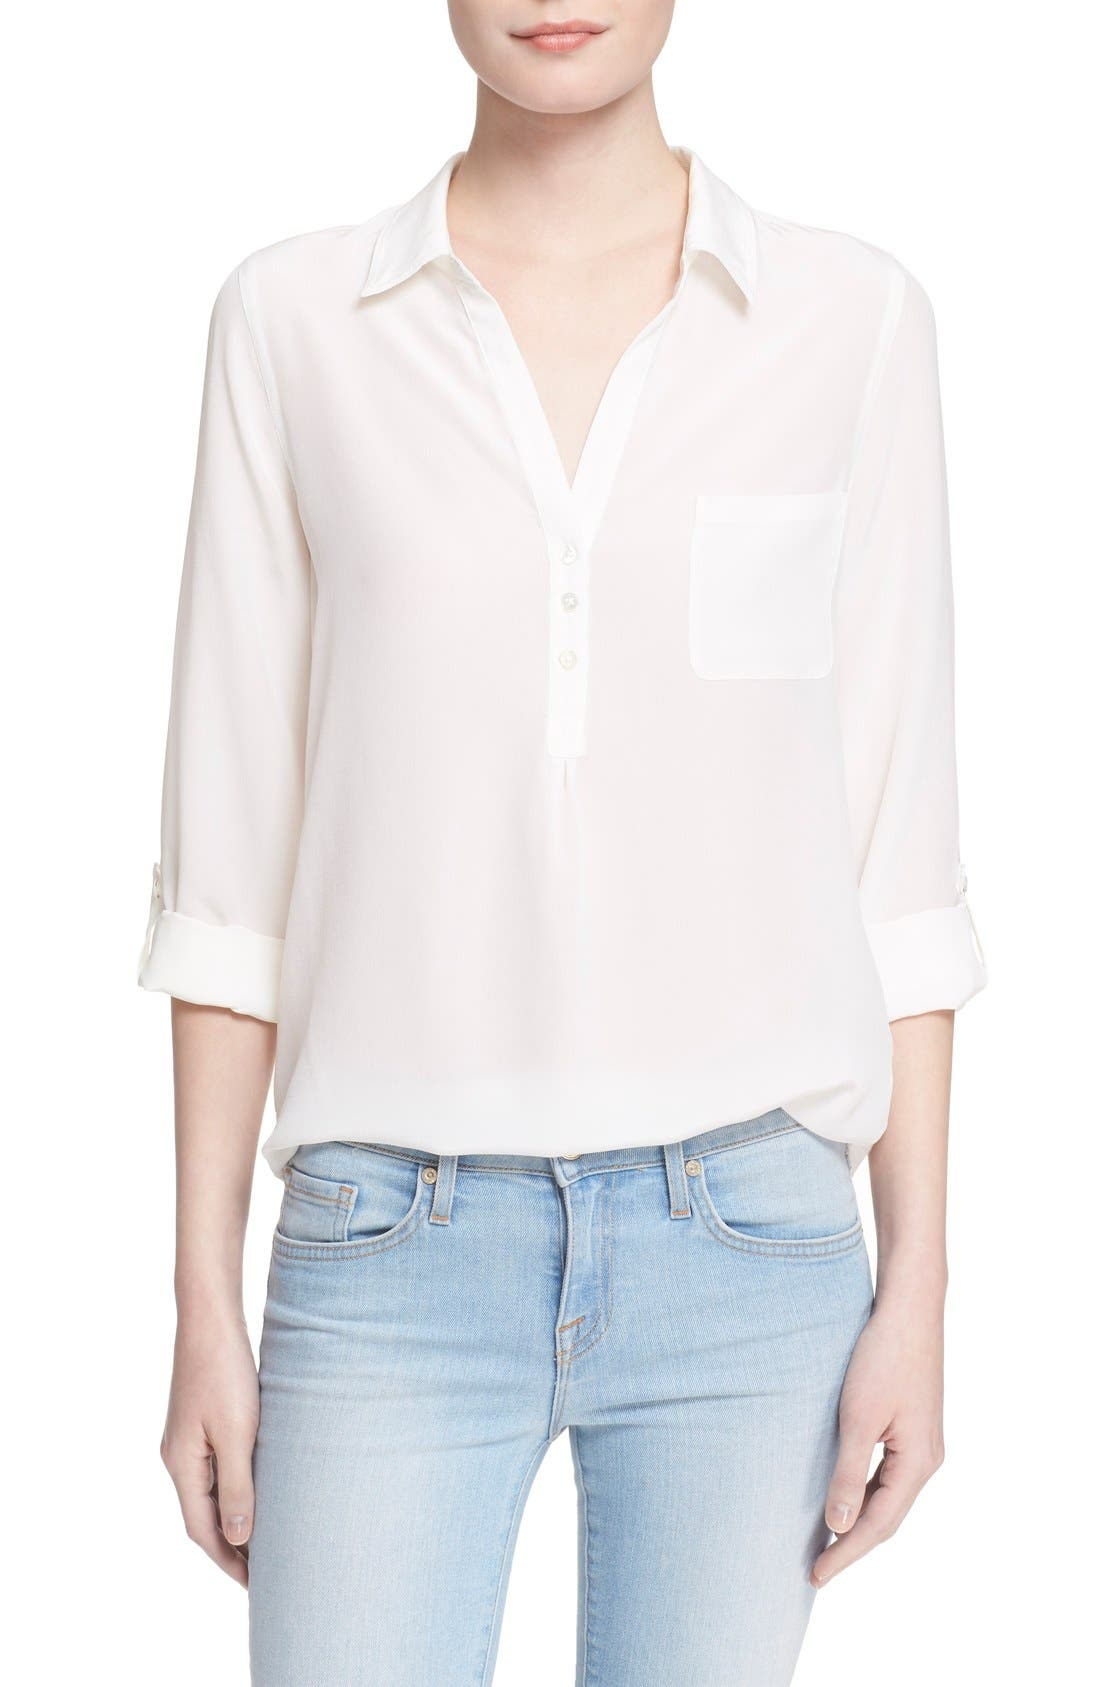 Main Image - Soft Joie 'Trikonis' Mixed Media Silk & Cotton Top